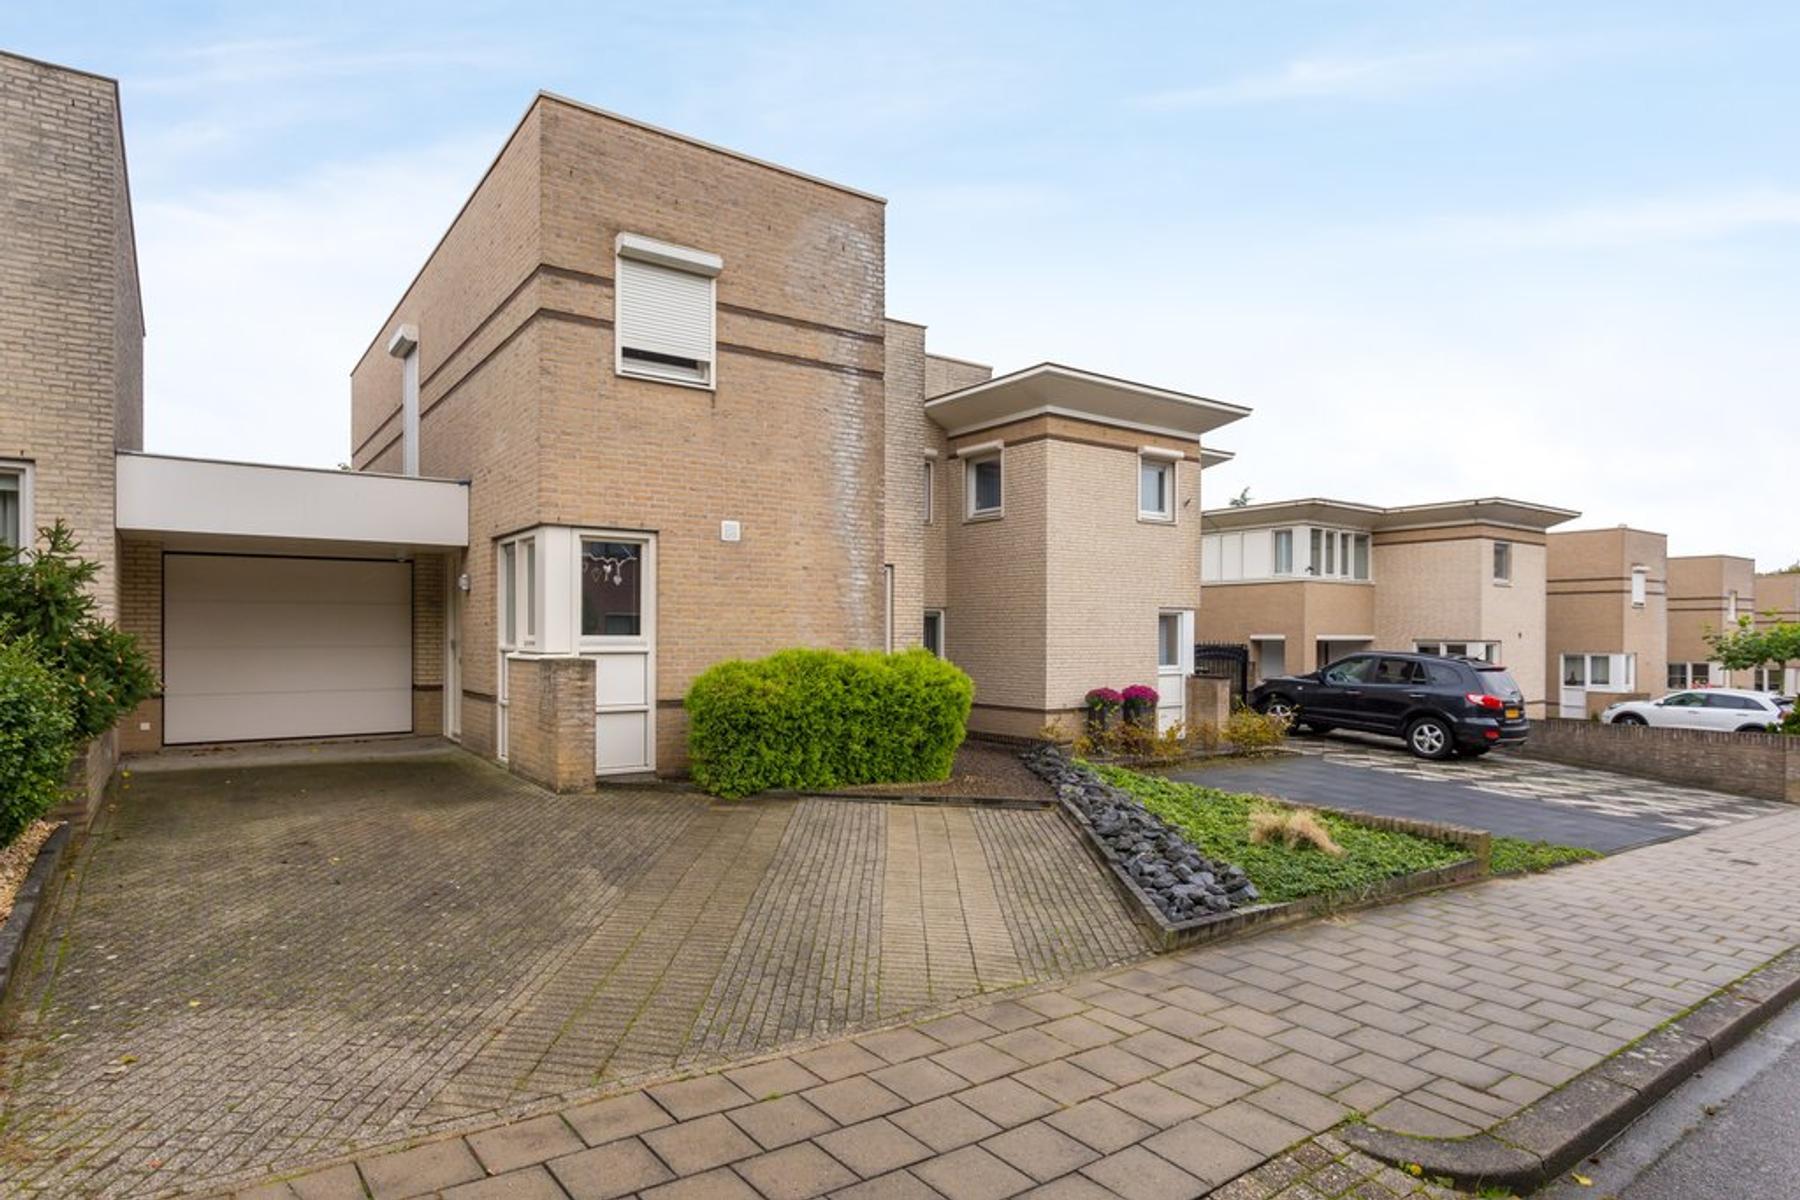 Arthur Van Schendelstraat 5 A in Landgraaf 6372 HS